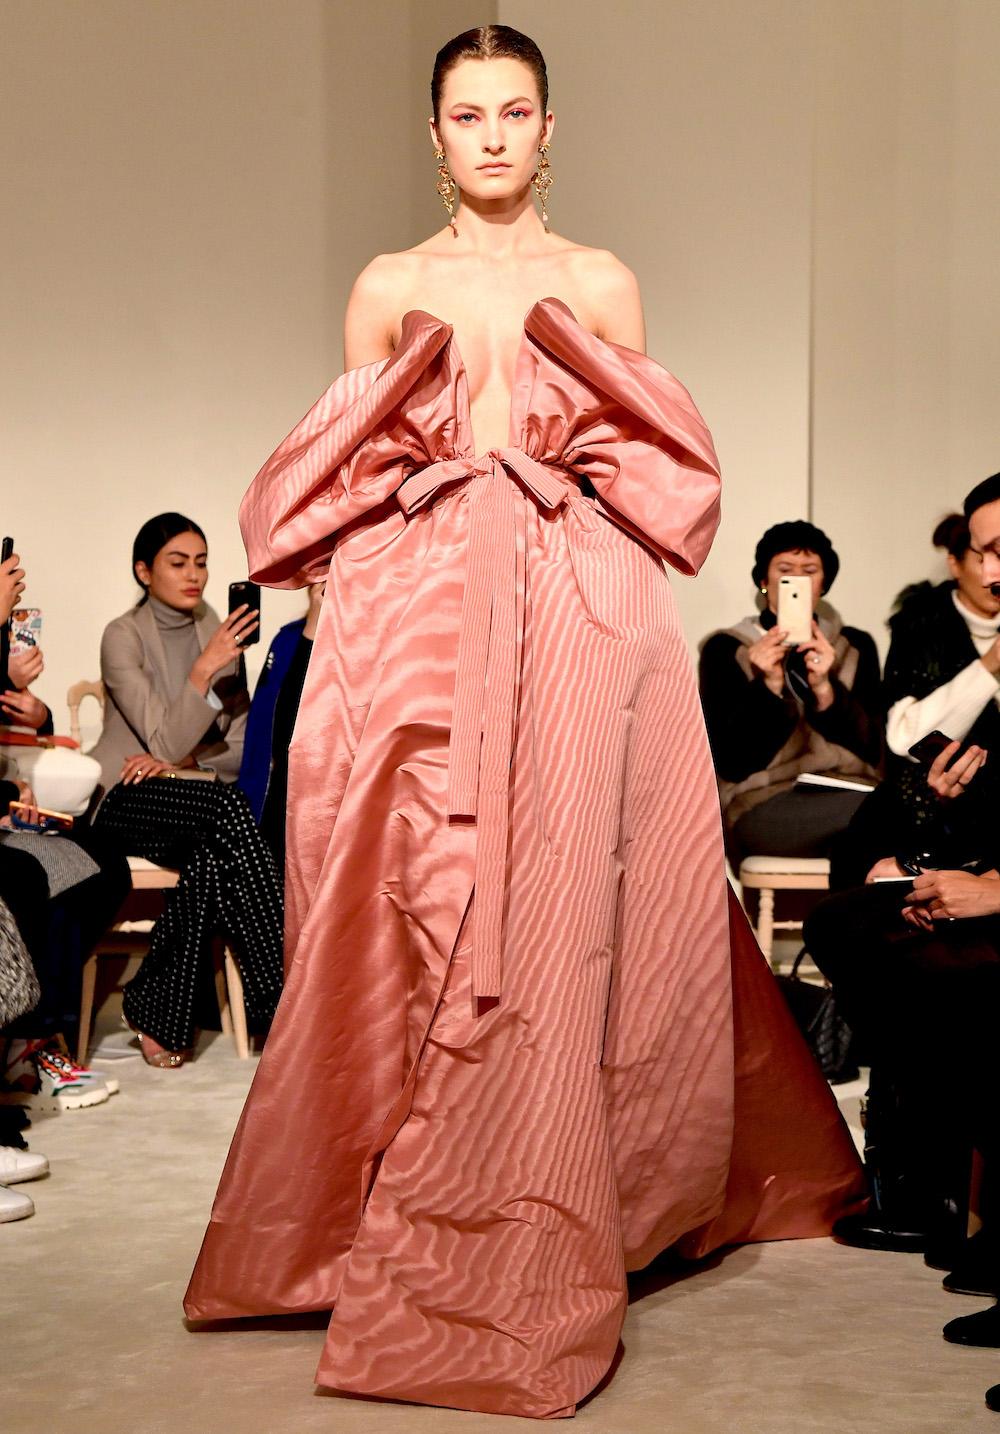 Цветочная поляна: новая коллекция Valentino Haute Couture SS'18